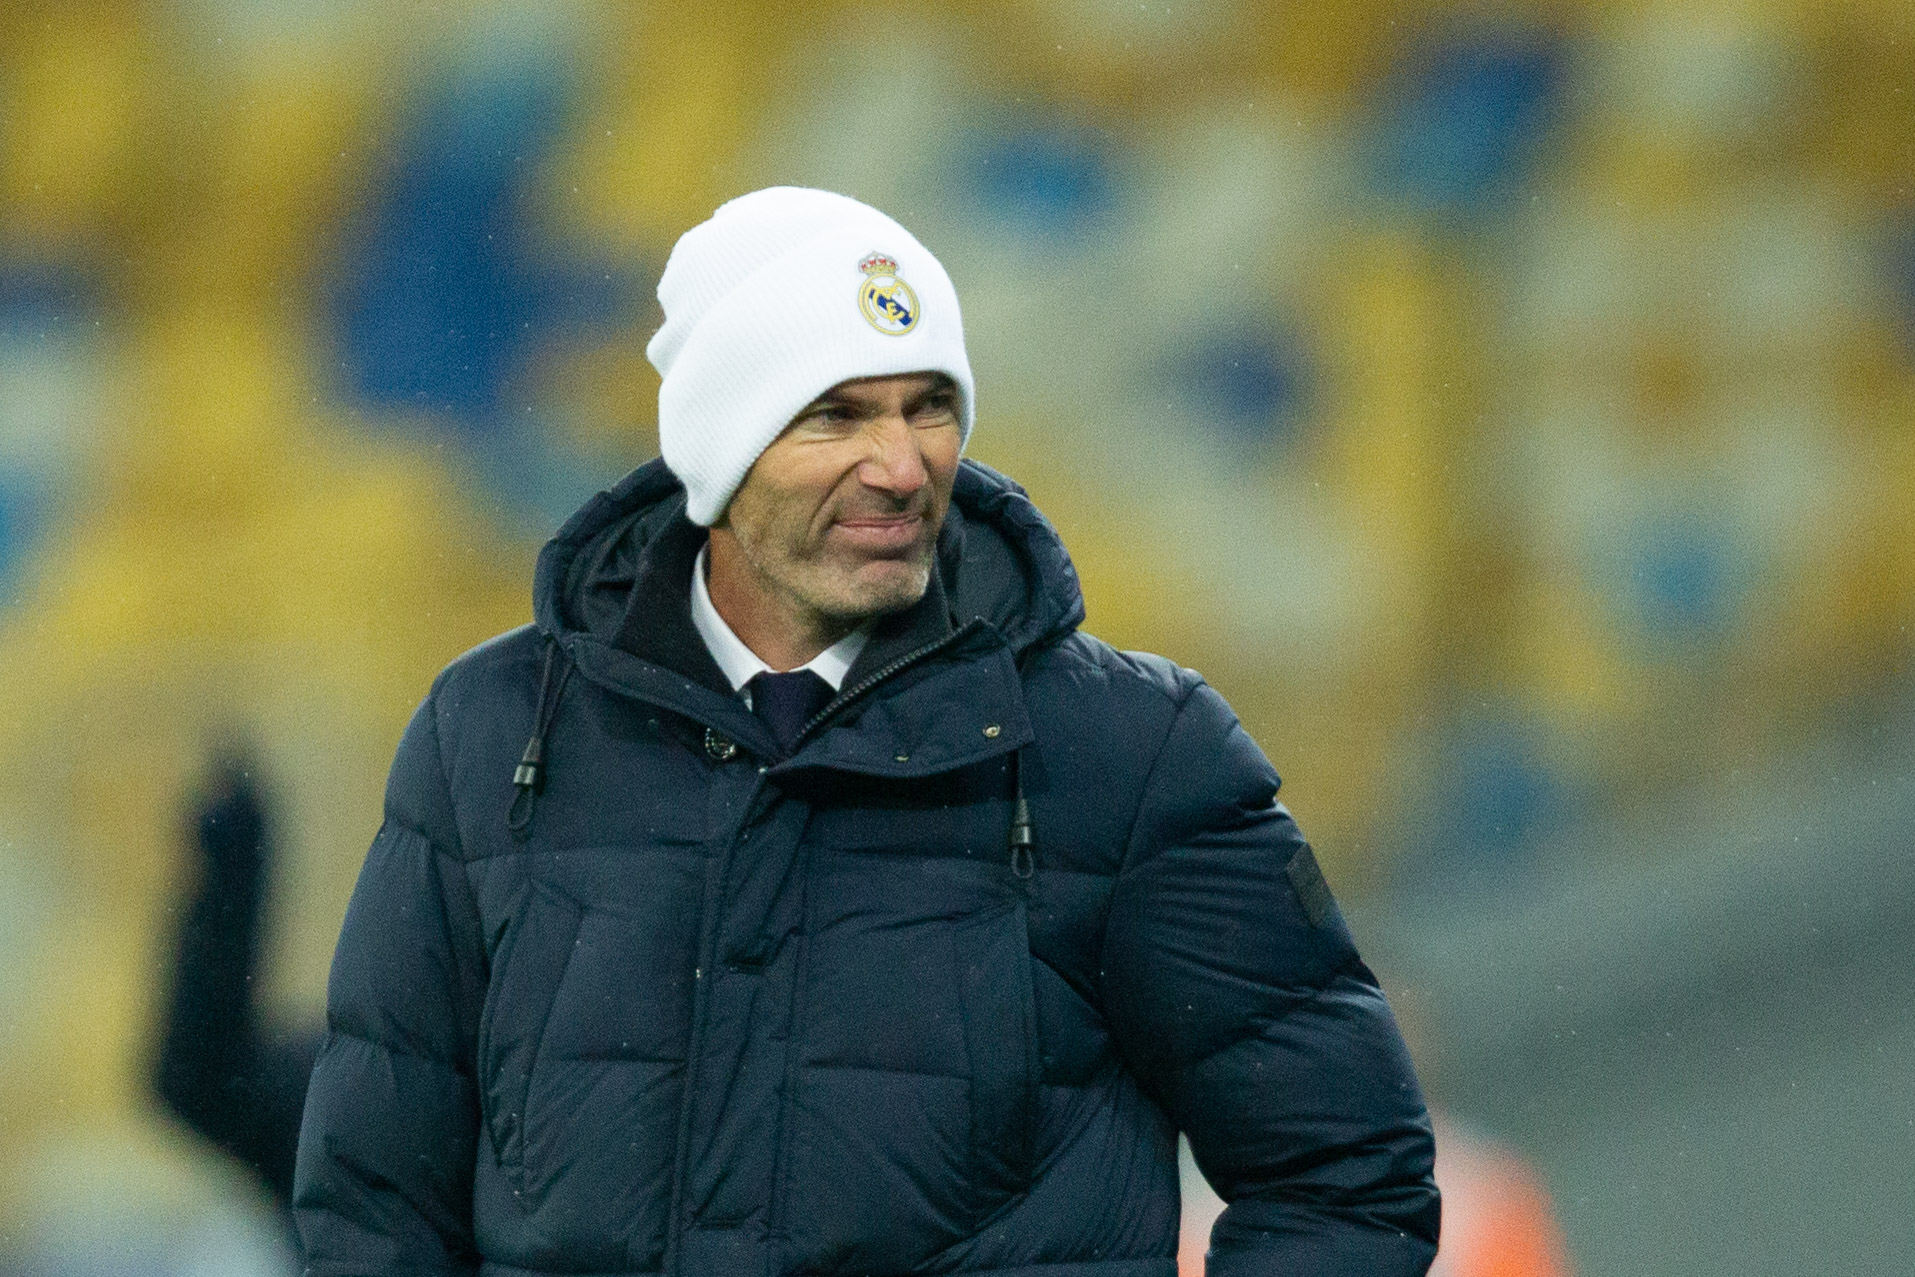 Zinedine Zidane - Real Madrid: Group B - UEFA Champions League